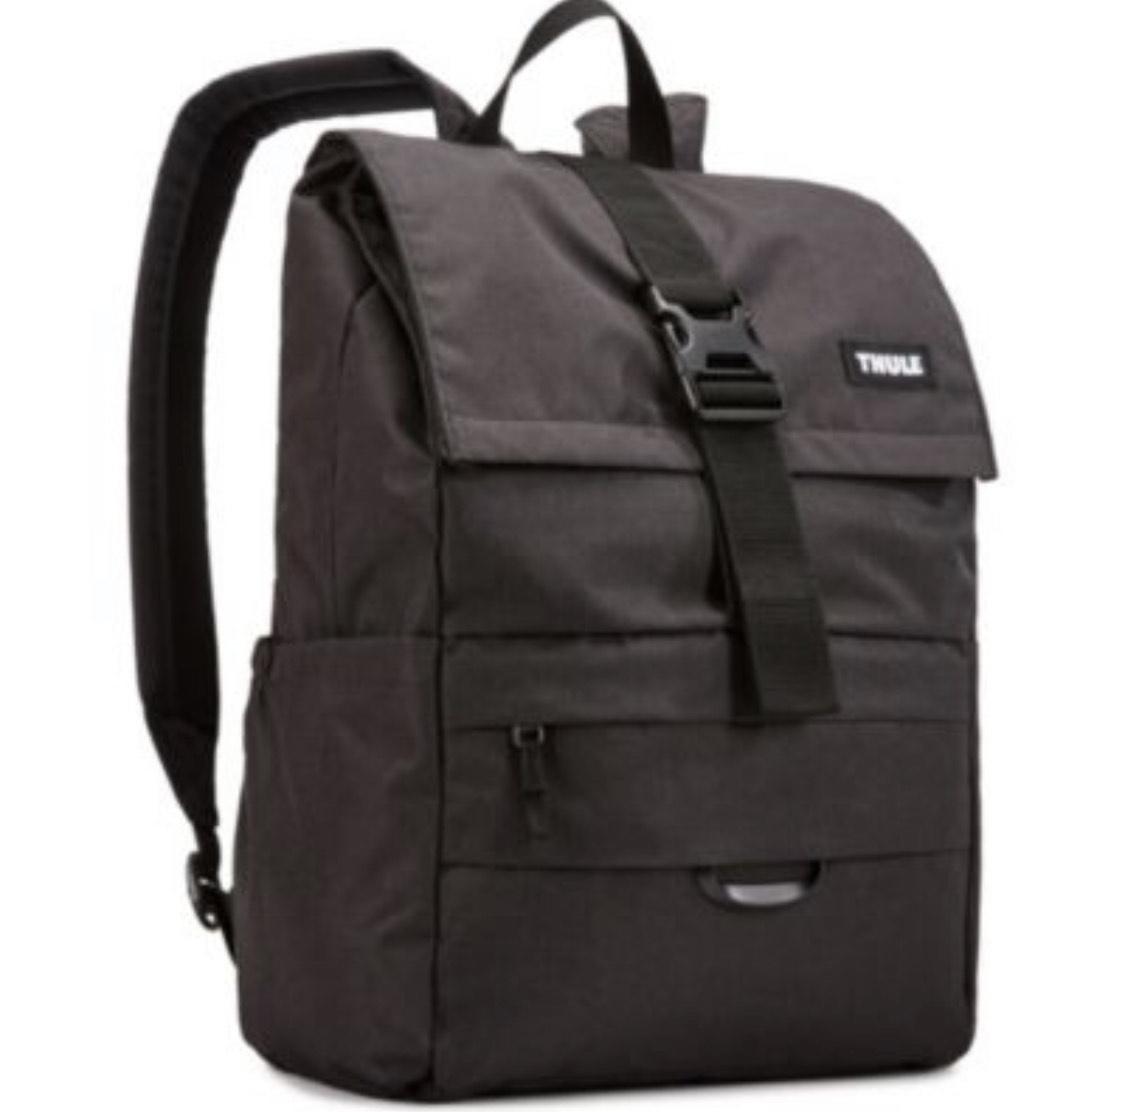 Sac à dos Thule Campus Aptitude Outset Backpack - 24L